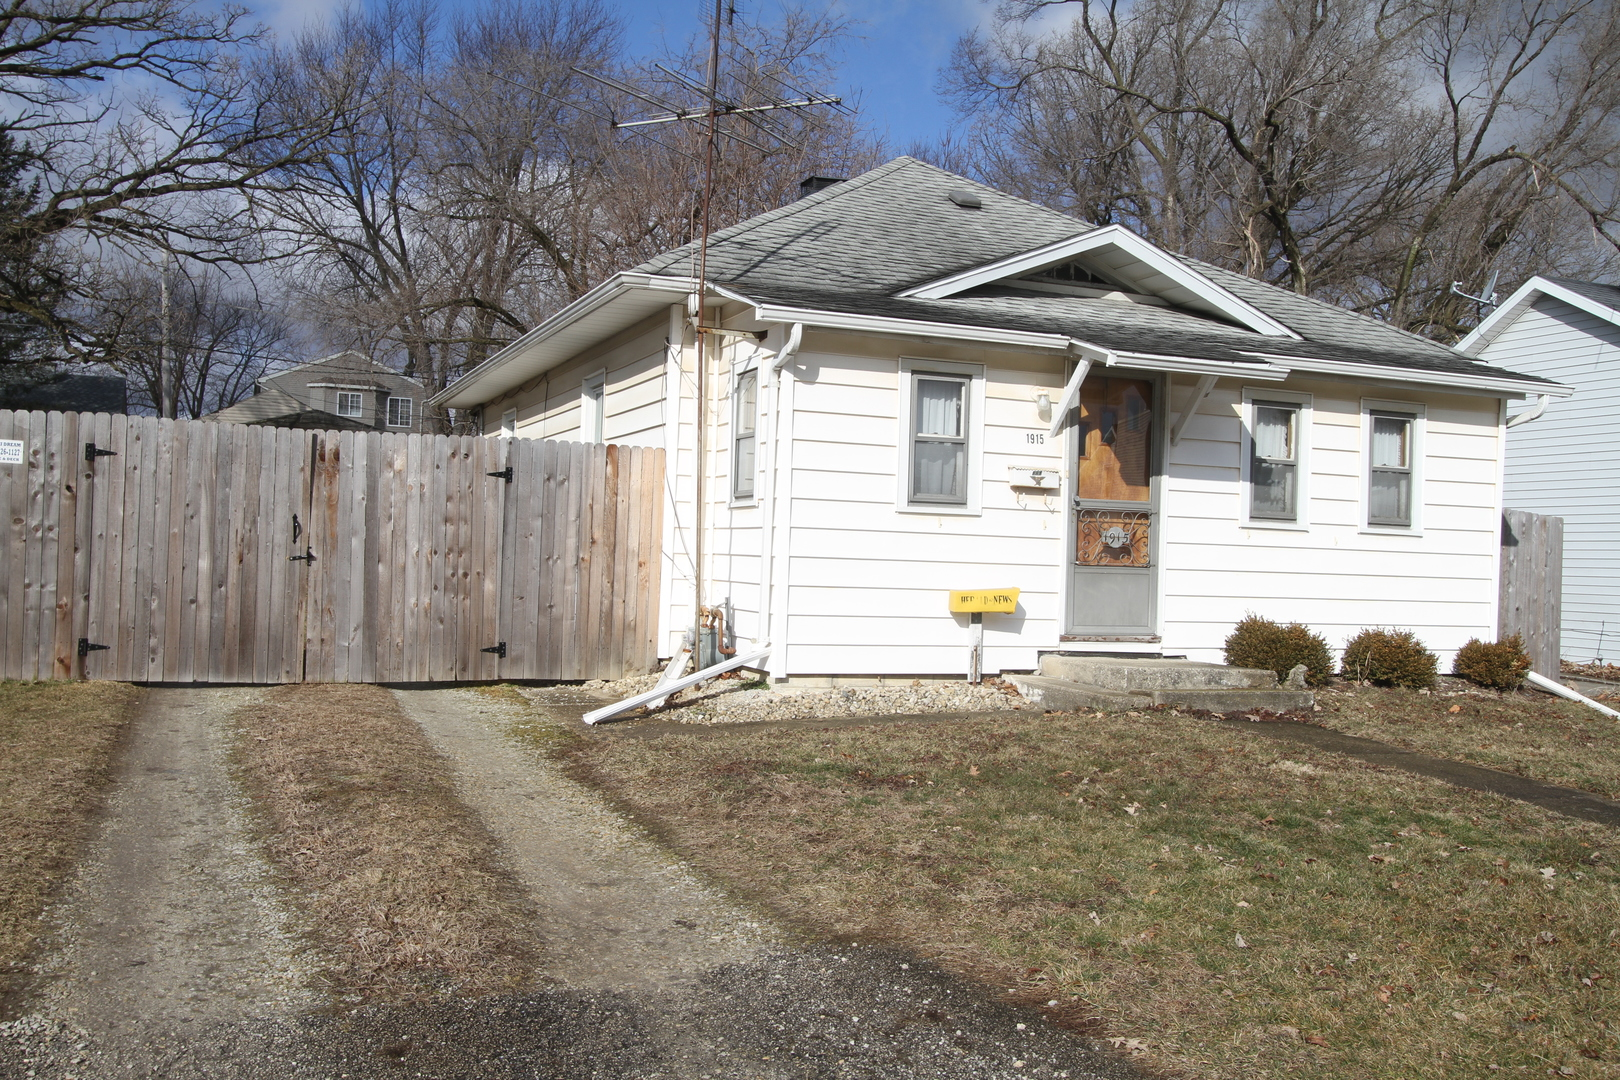 1915 Cora, Crest Hill, Illinois, 60403